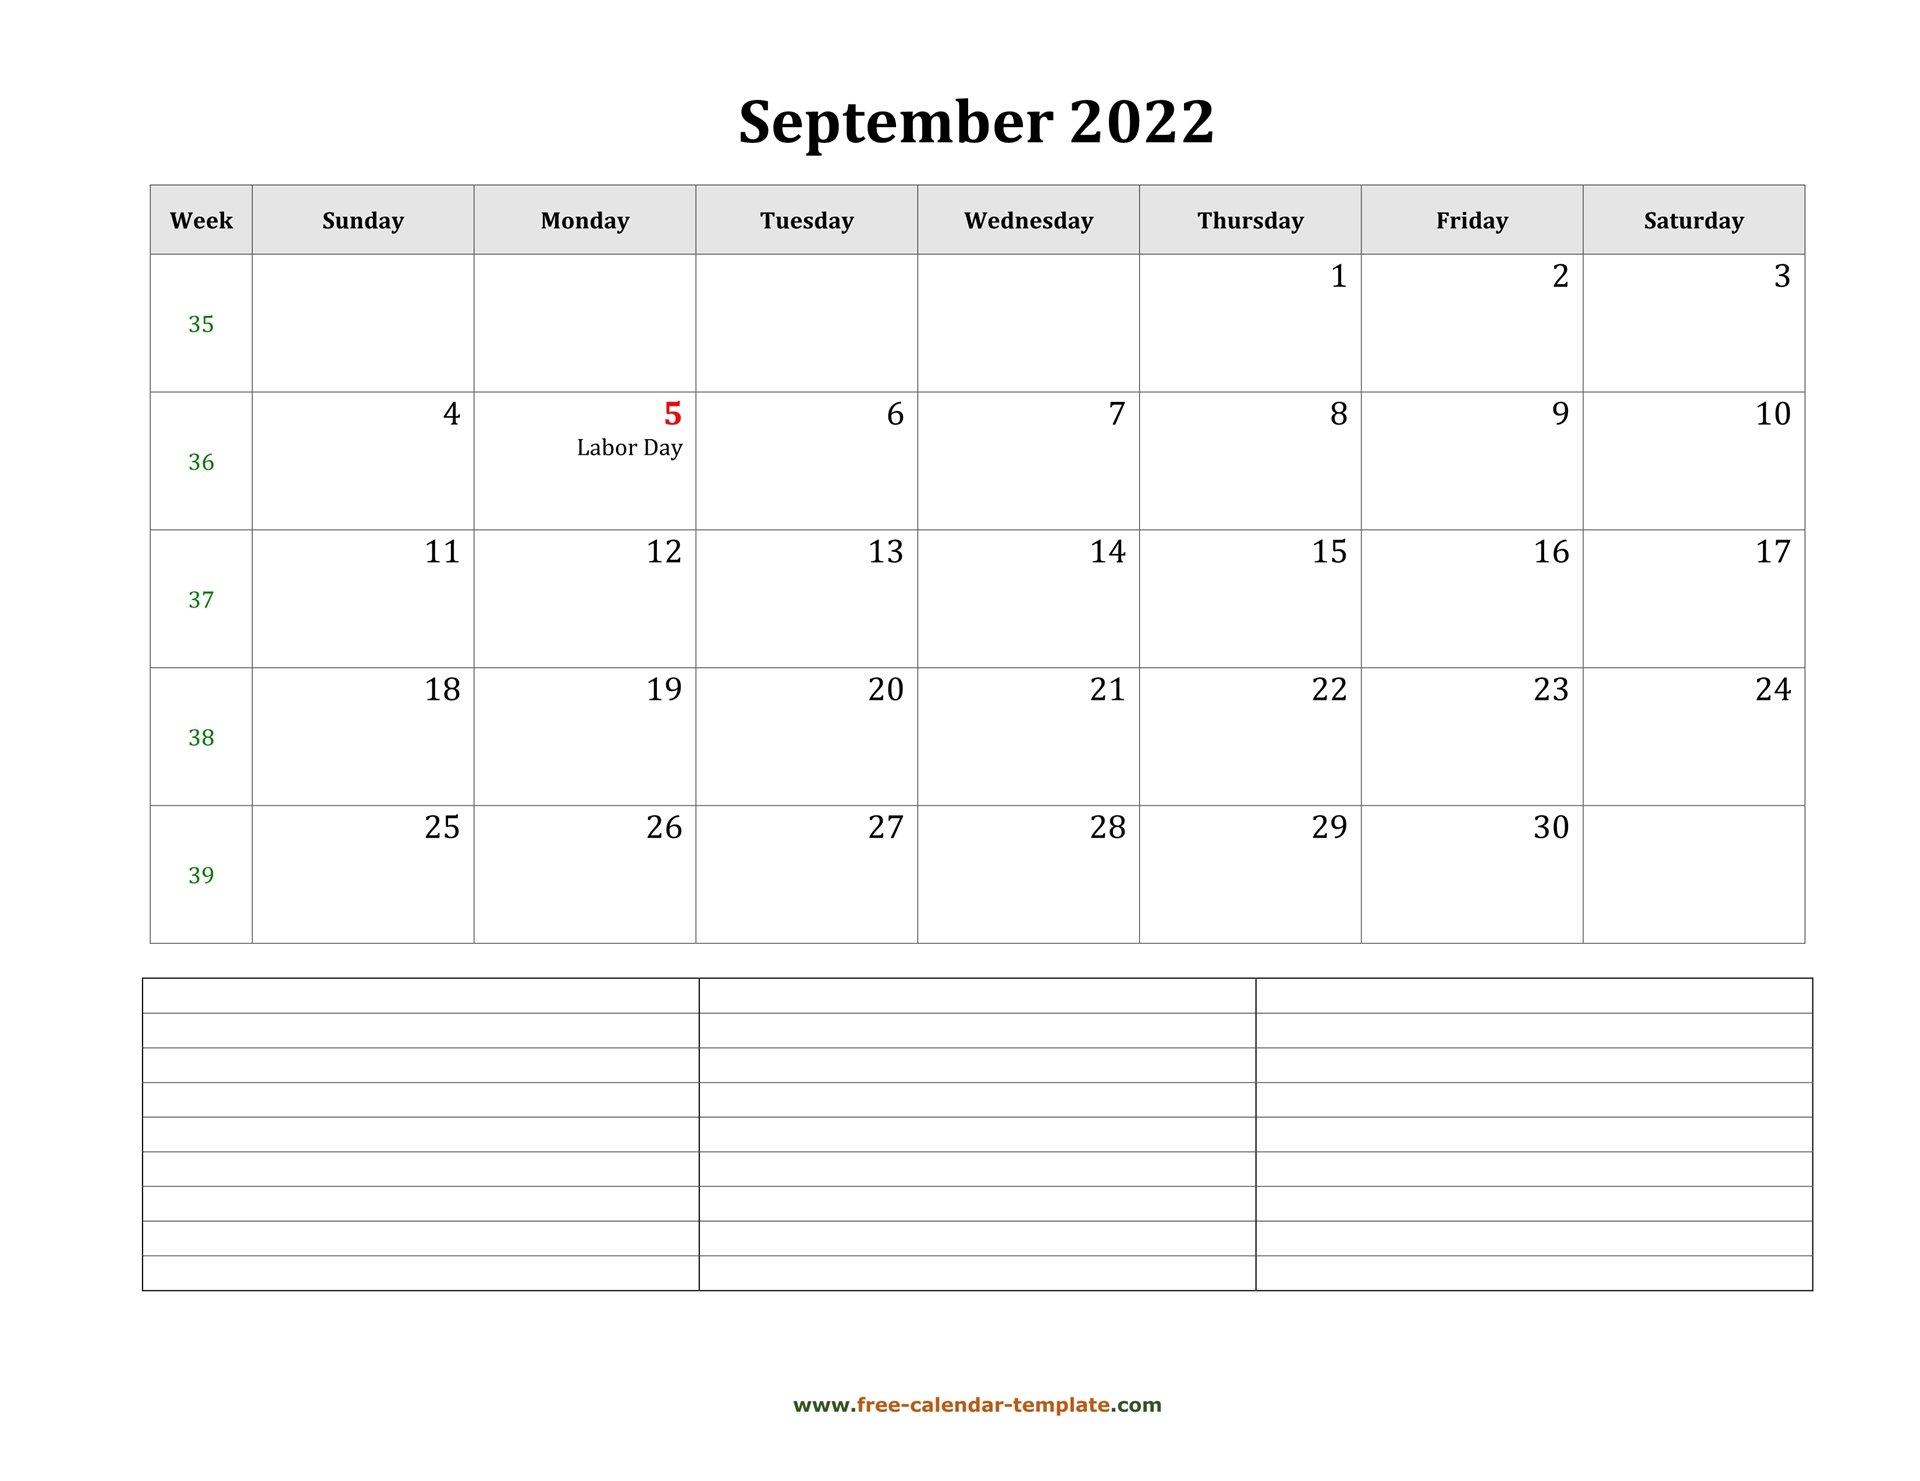 September 2022 Free Calendar Tempplate   Free-Calendar within September 2022 Calendar Template